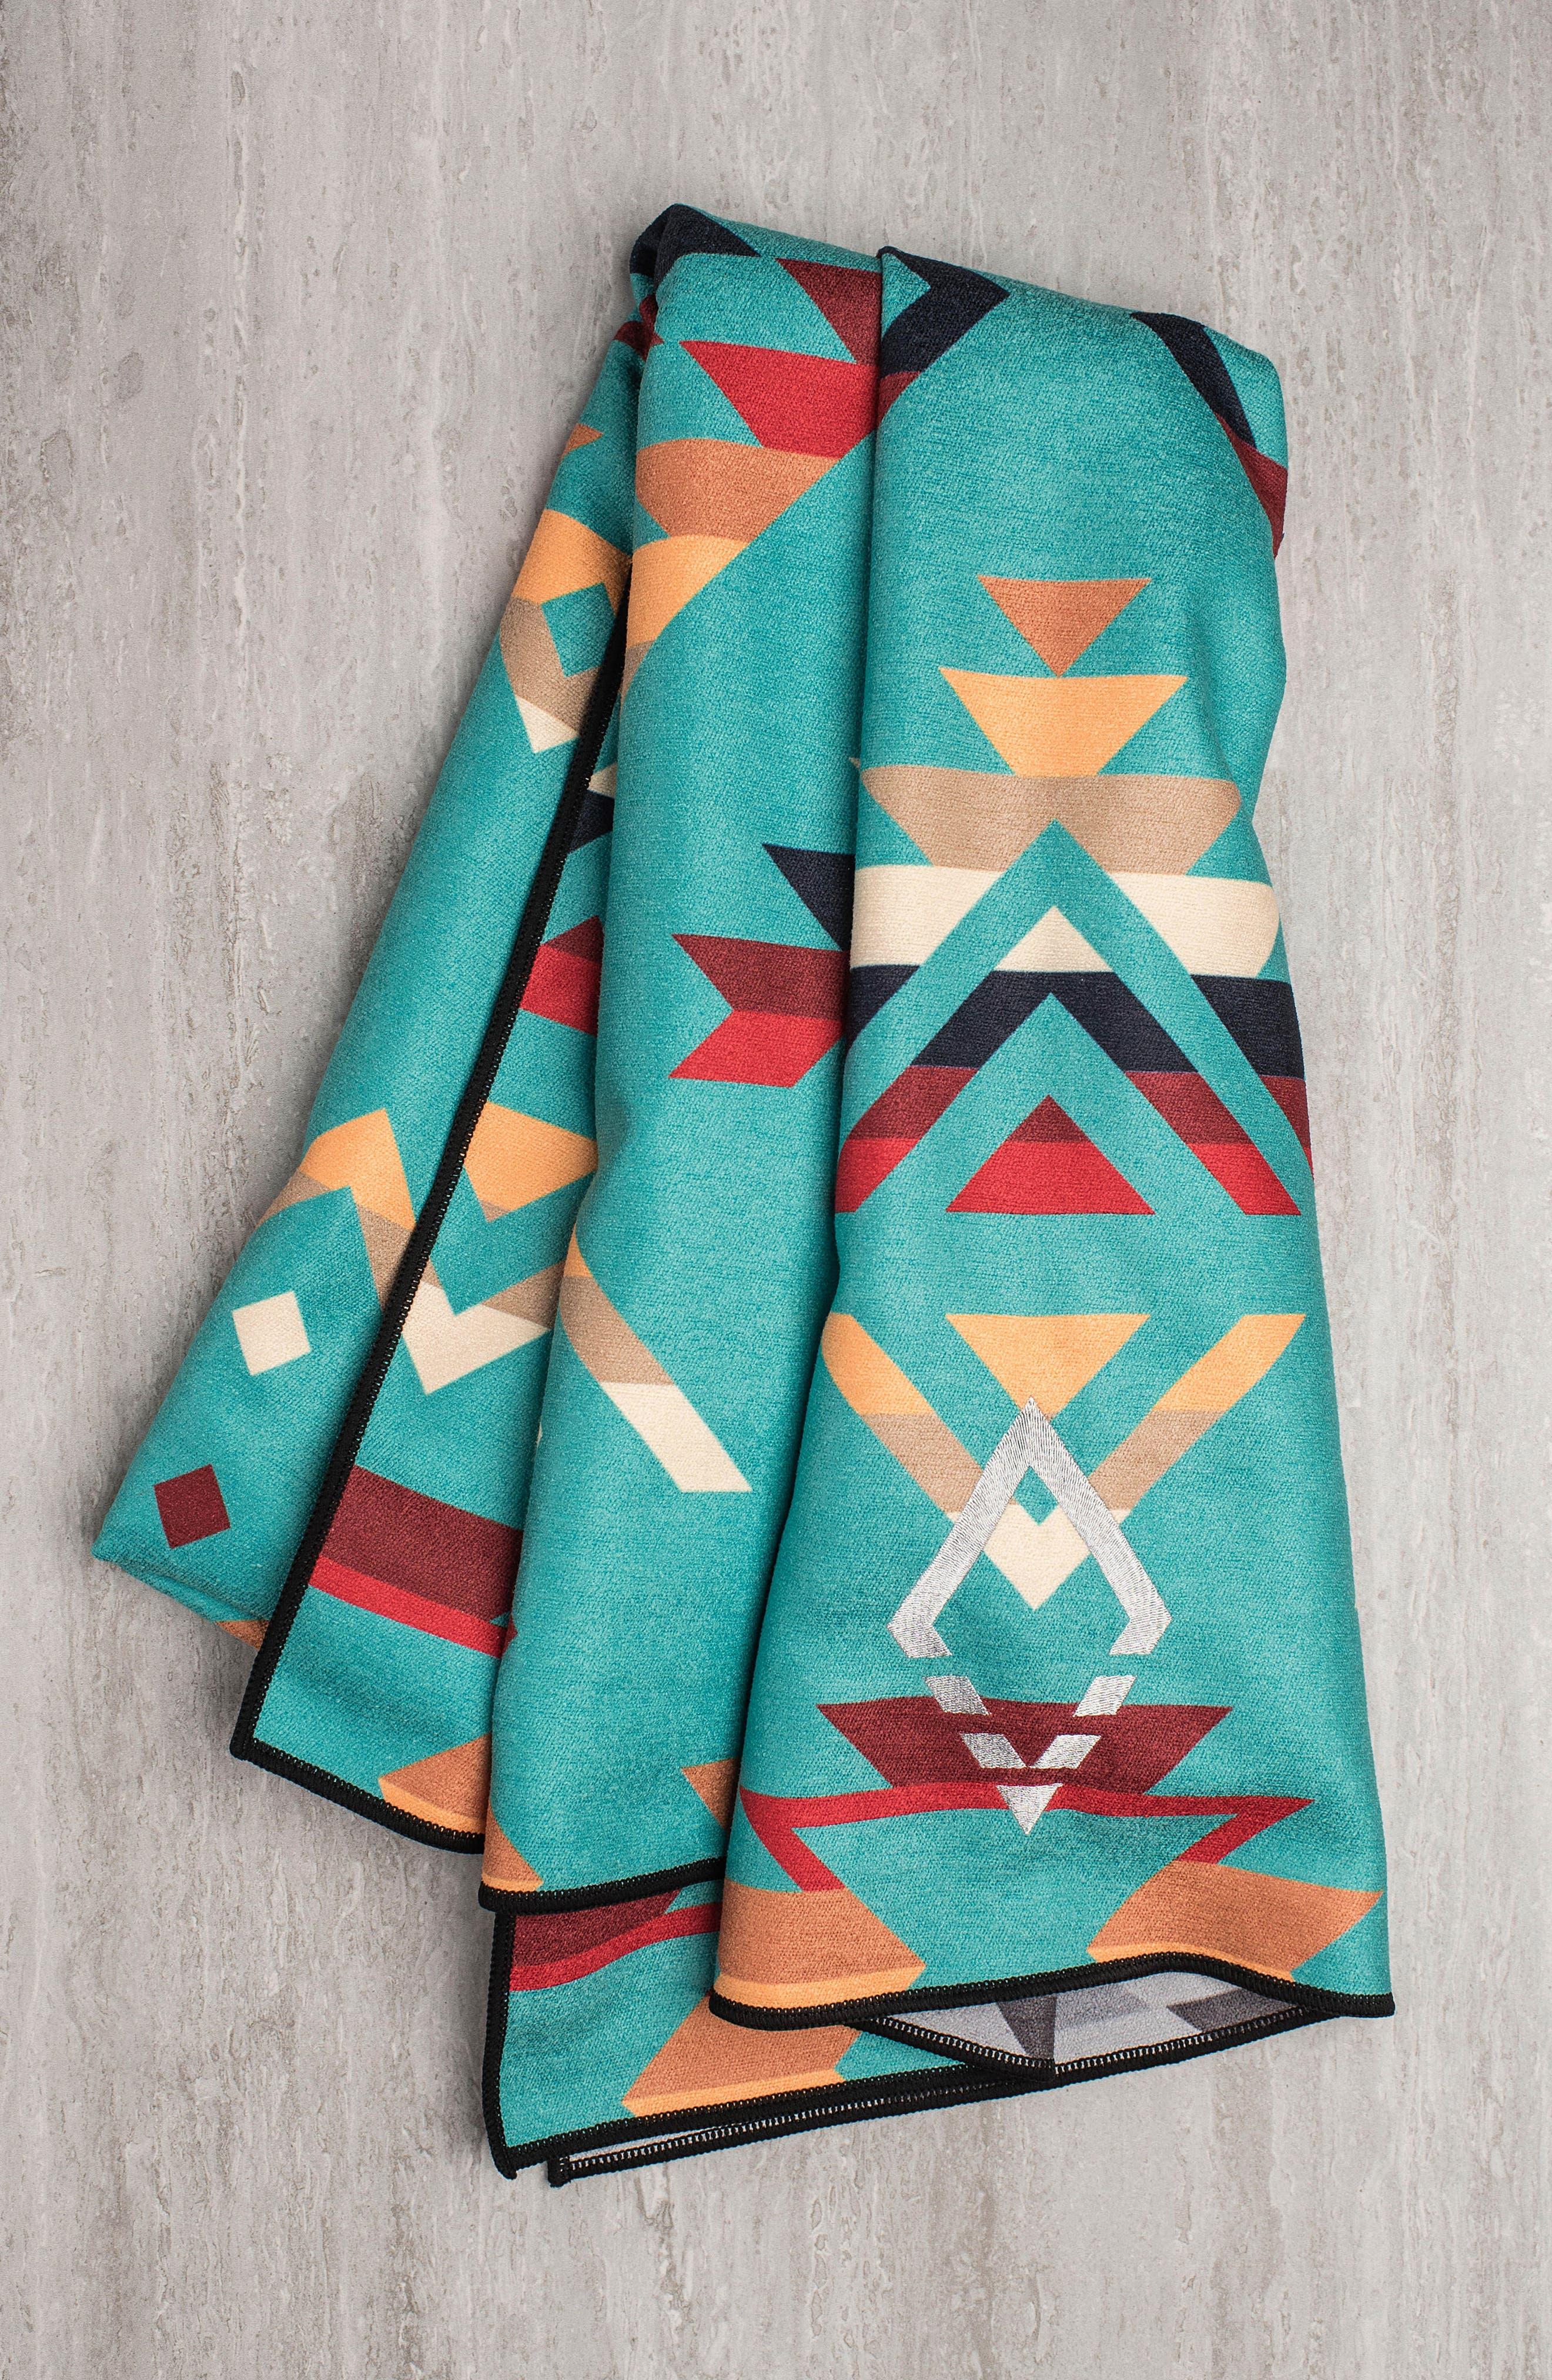 PNW Yoga Towel,                             Alternate thumbnail 2, color,                             High Alpine